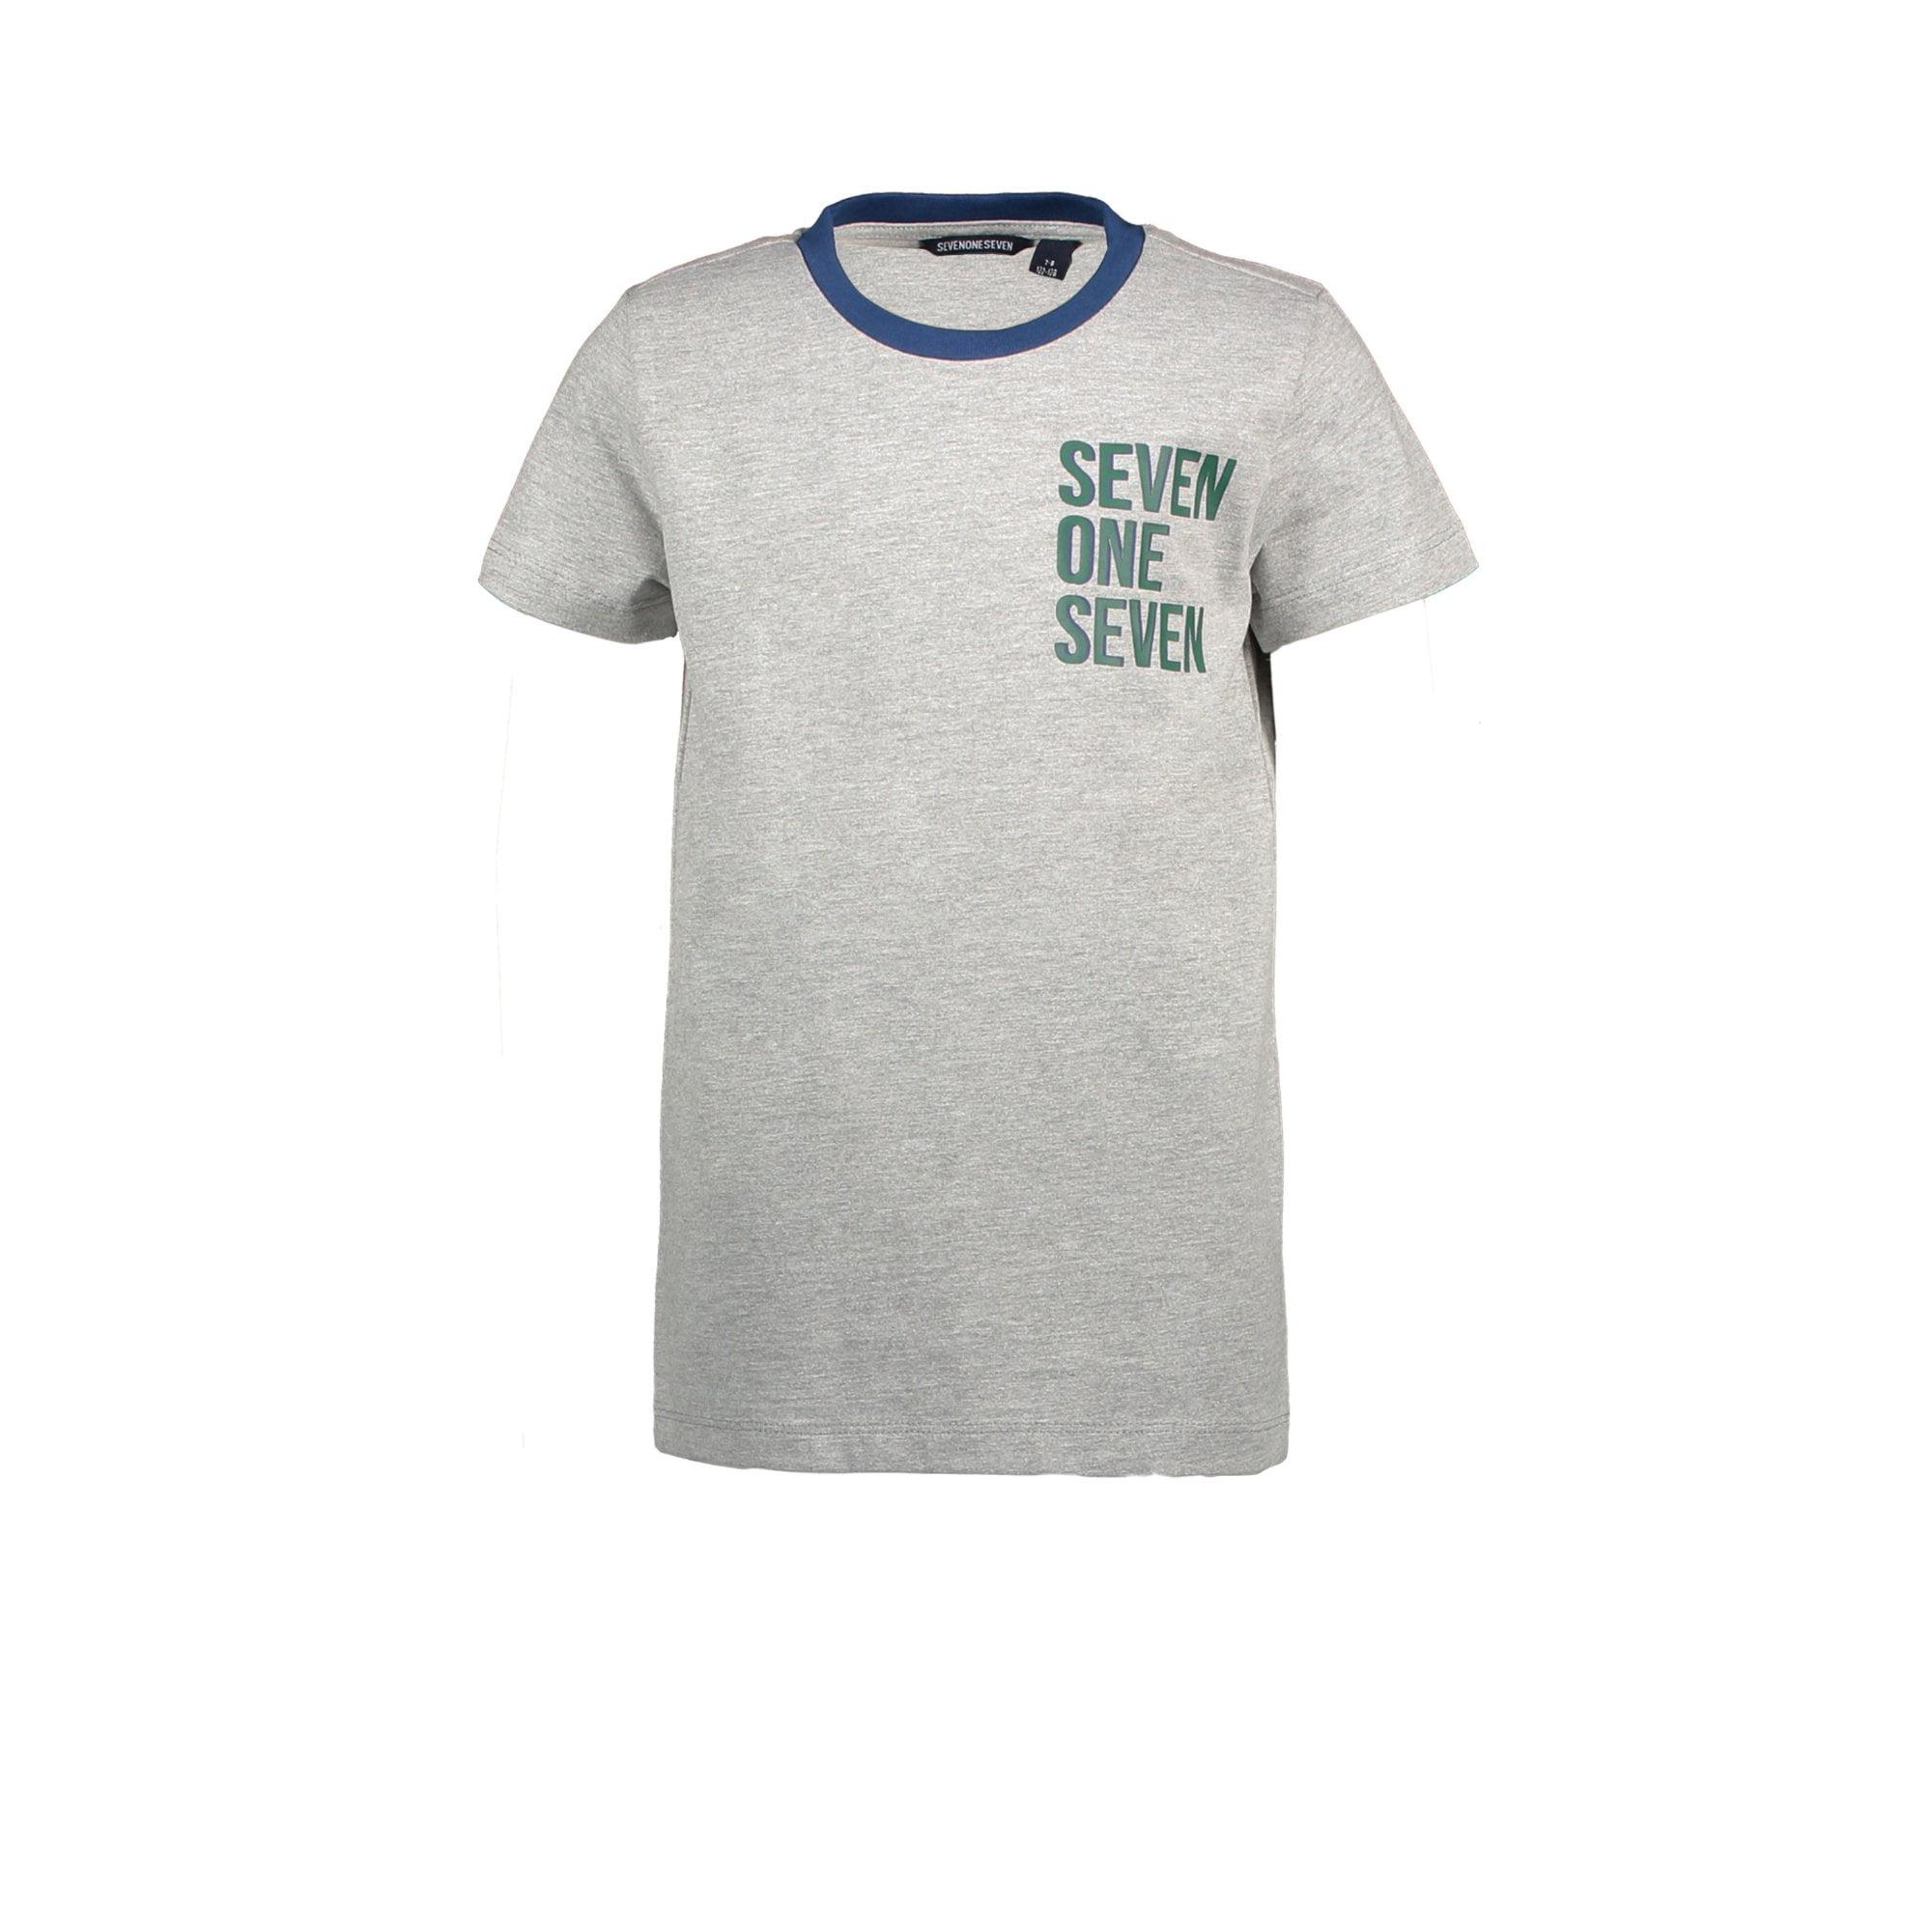 Tedy Short sleeves T-shirt